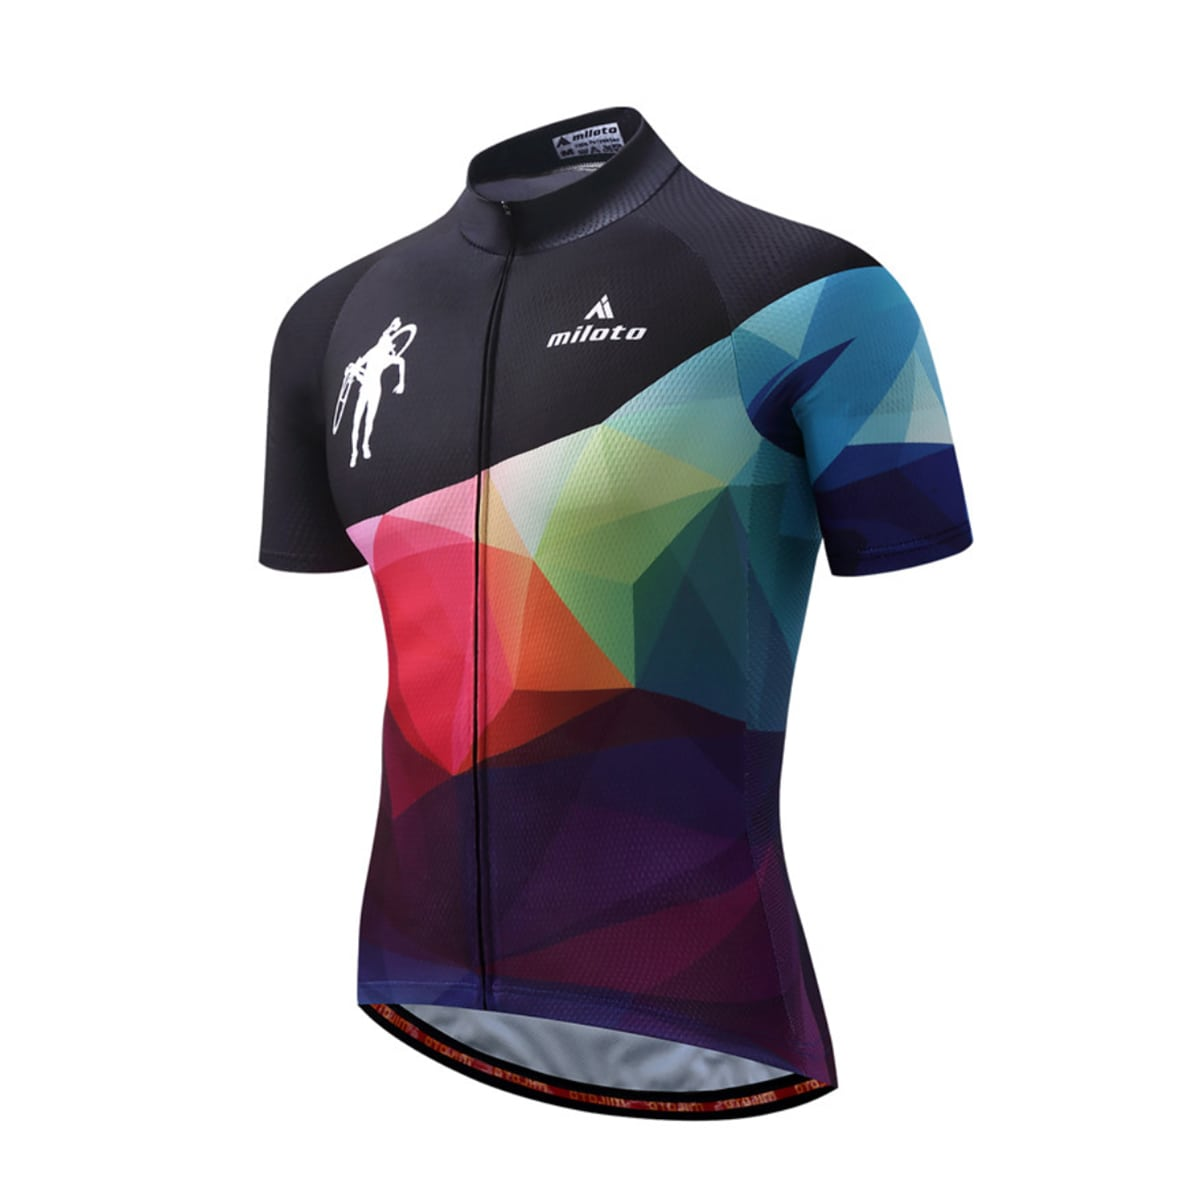 maillot original multicolore cyclisme vélo cycliste